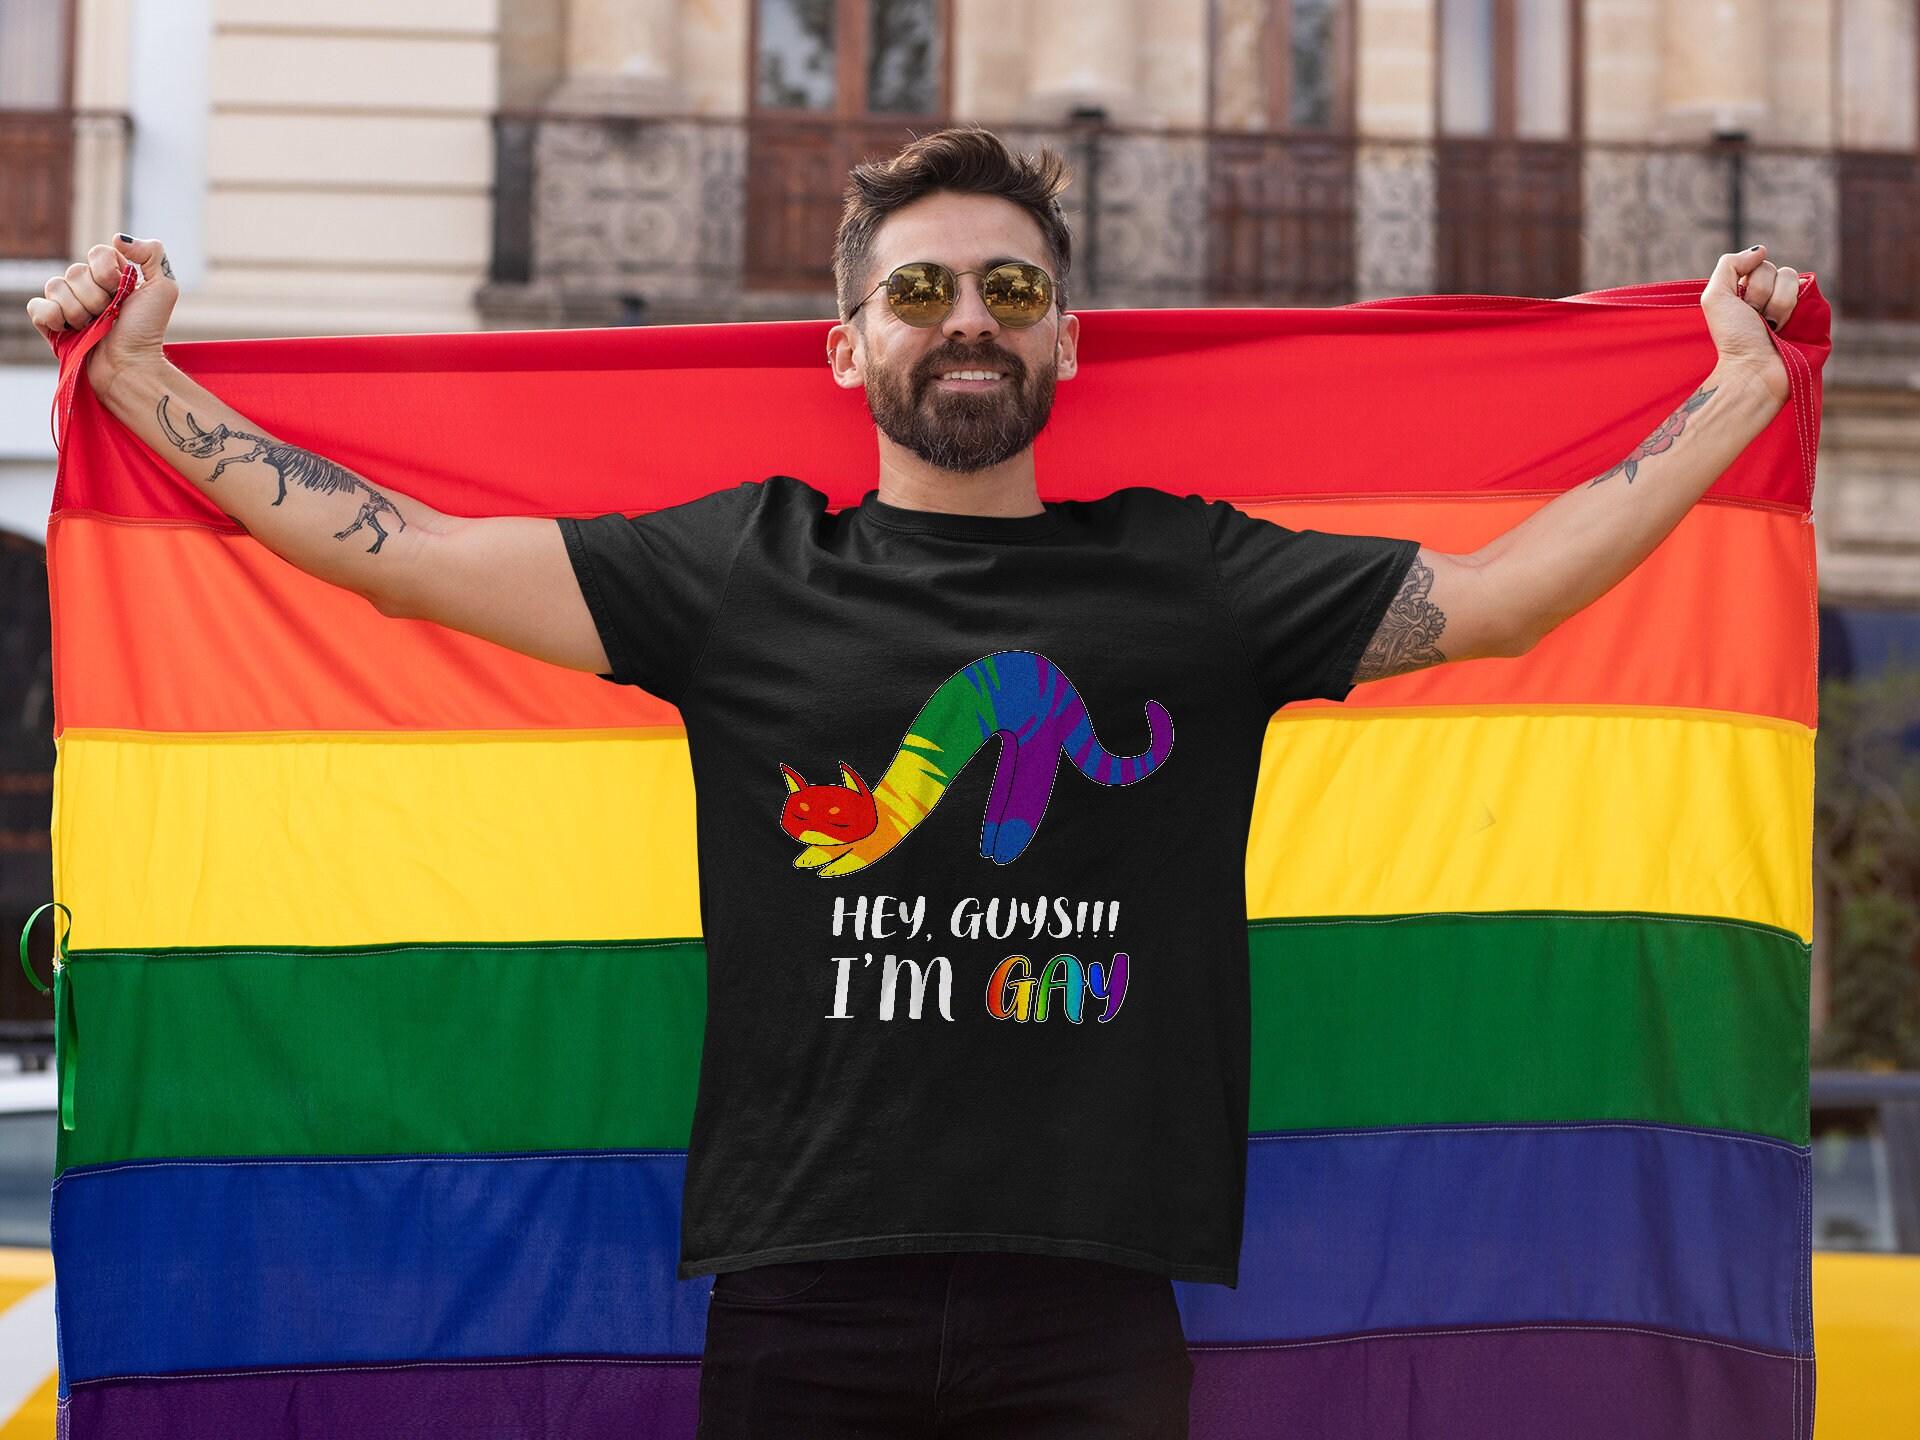 Hey Guy ich bin Homosexuell Shirt Katze LGBT Shirt Gay